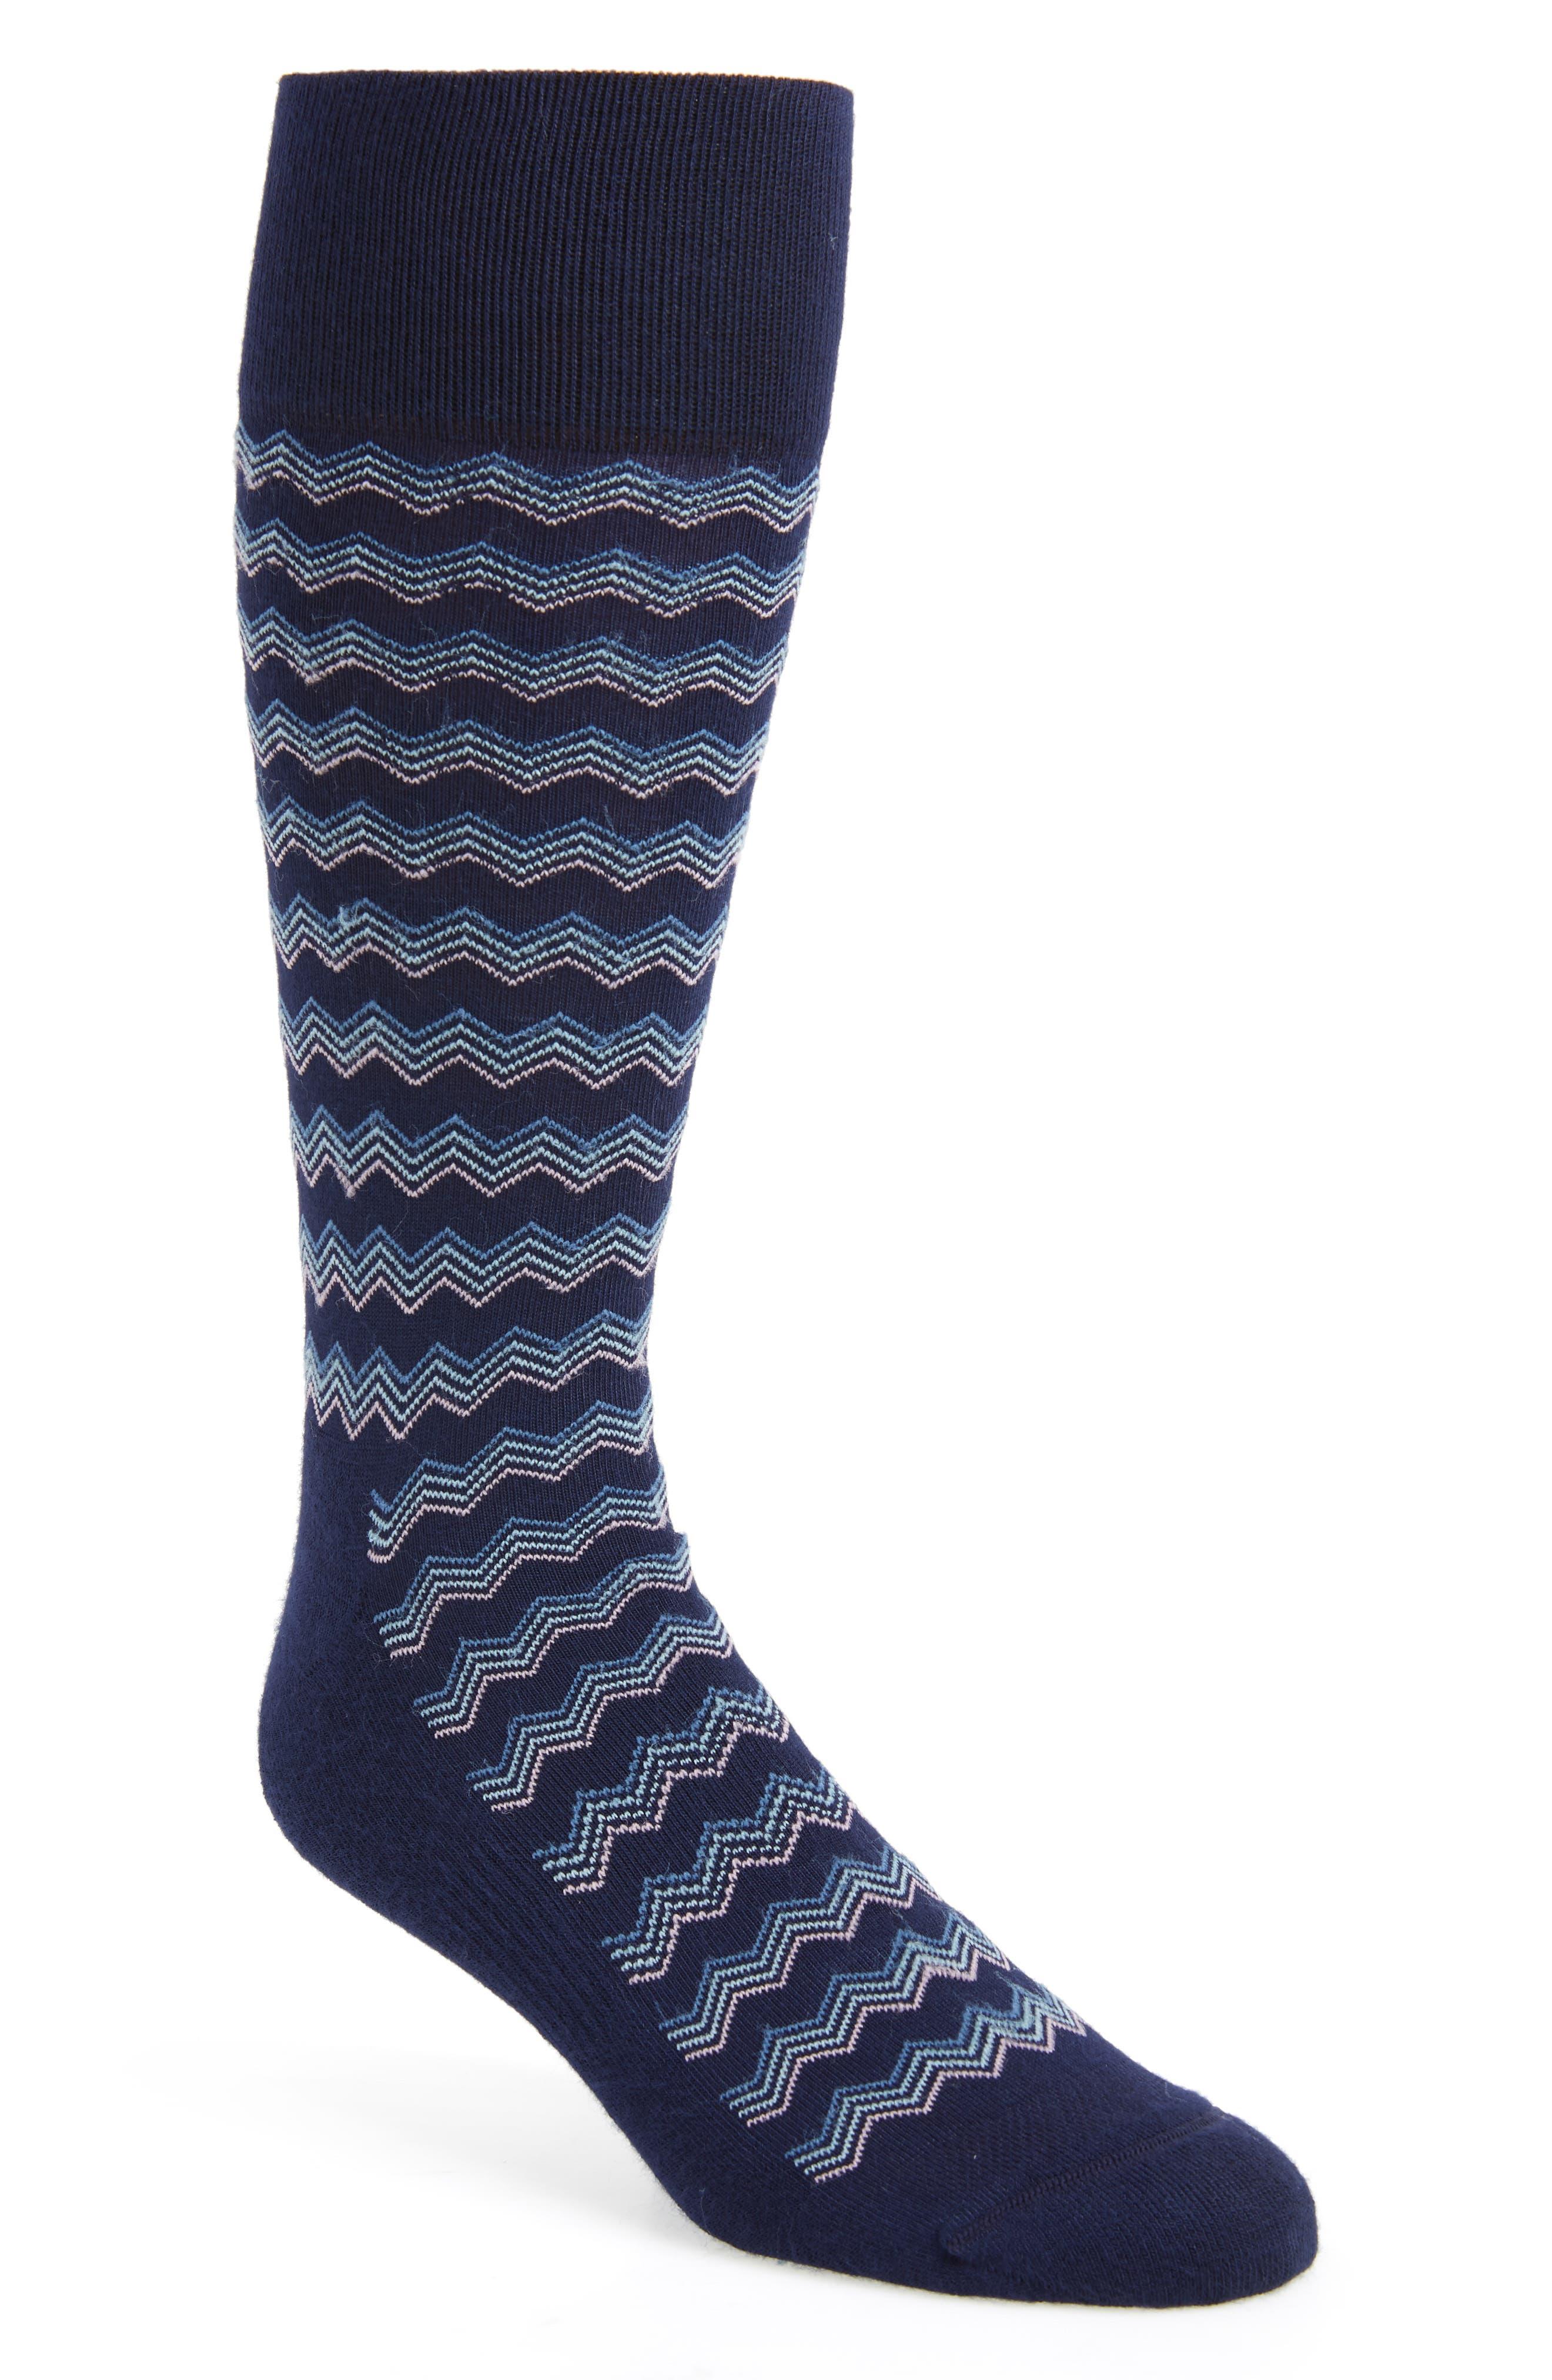 Stripe Socks,                             Main thumbnail 1, color,                             NAVY/ BLUE